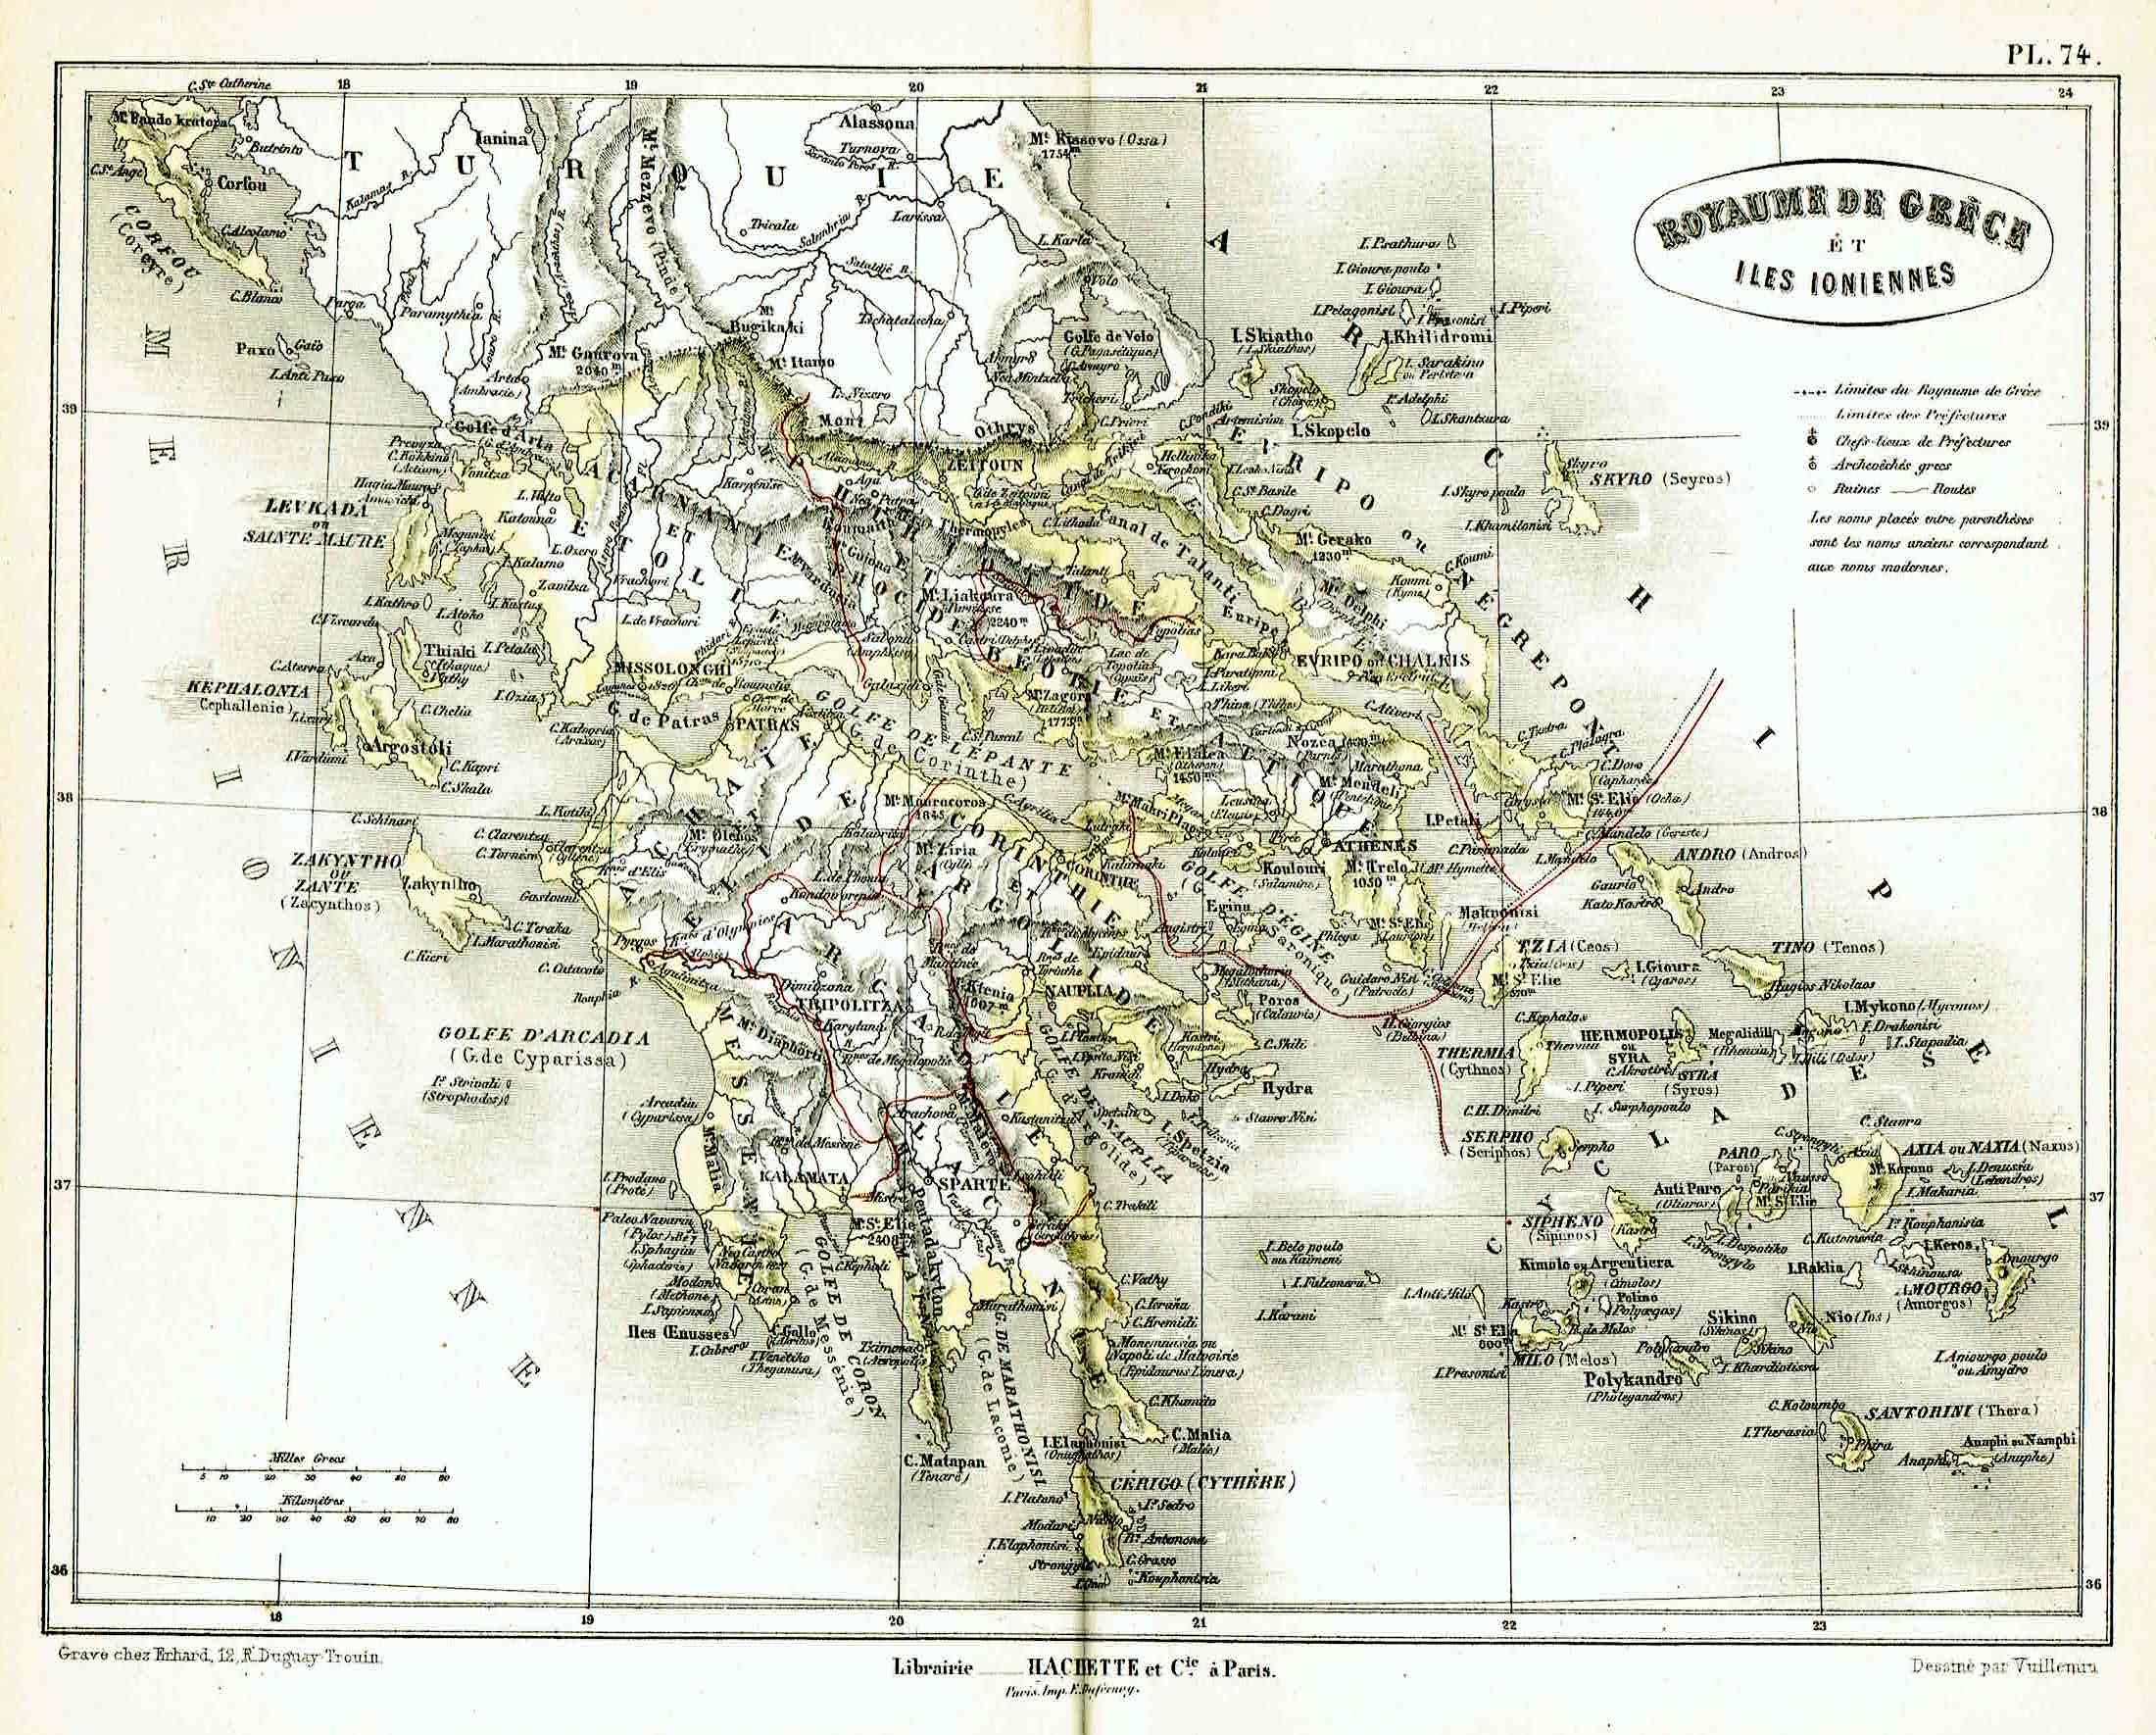 grecia ionica vorzet